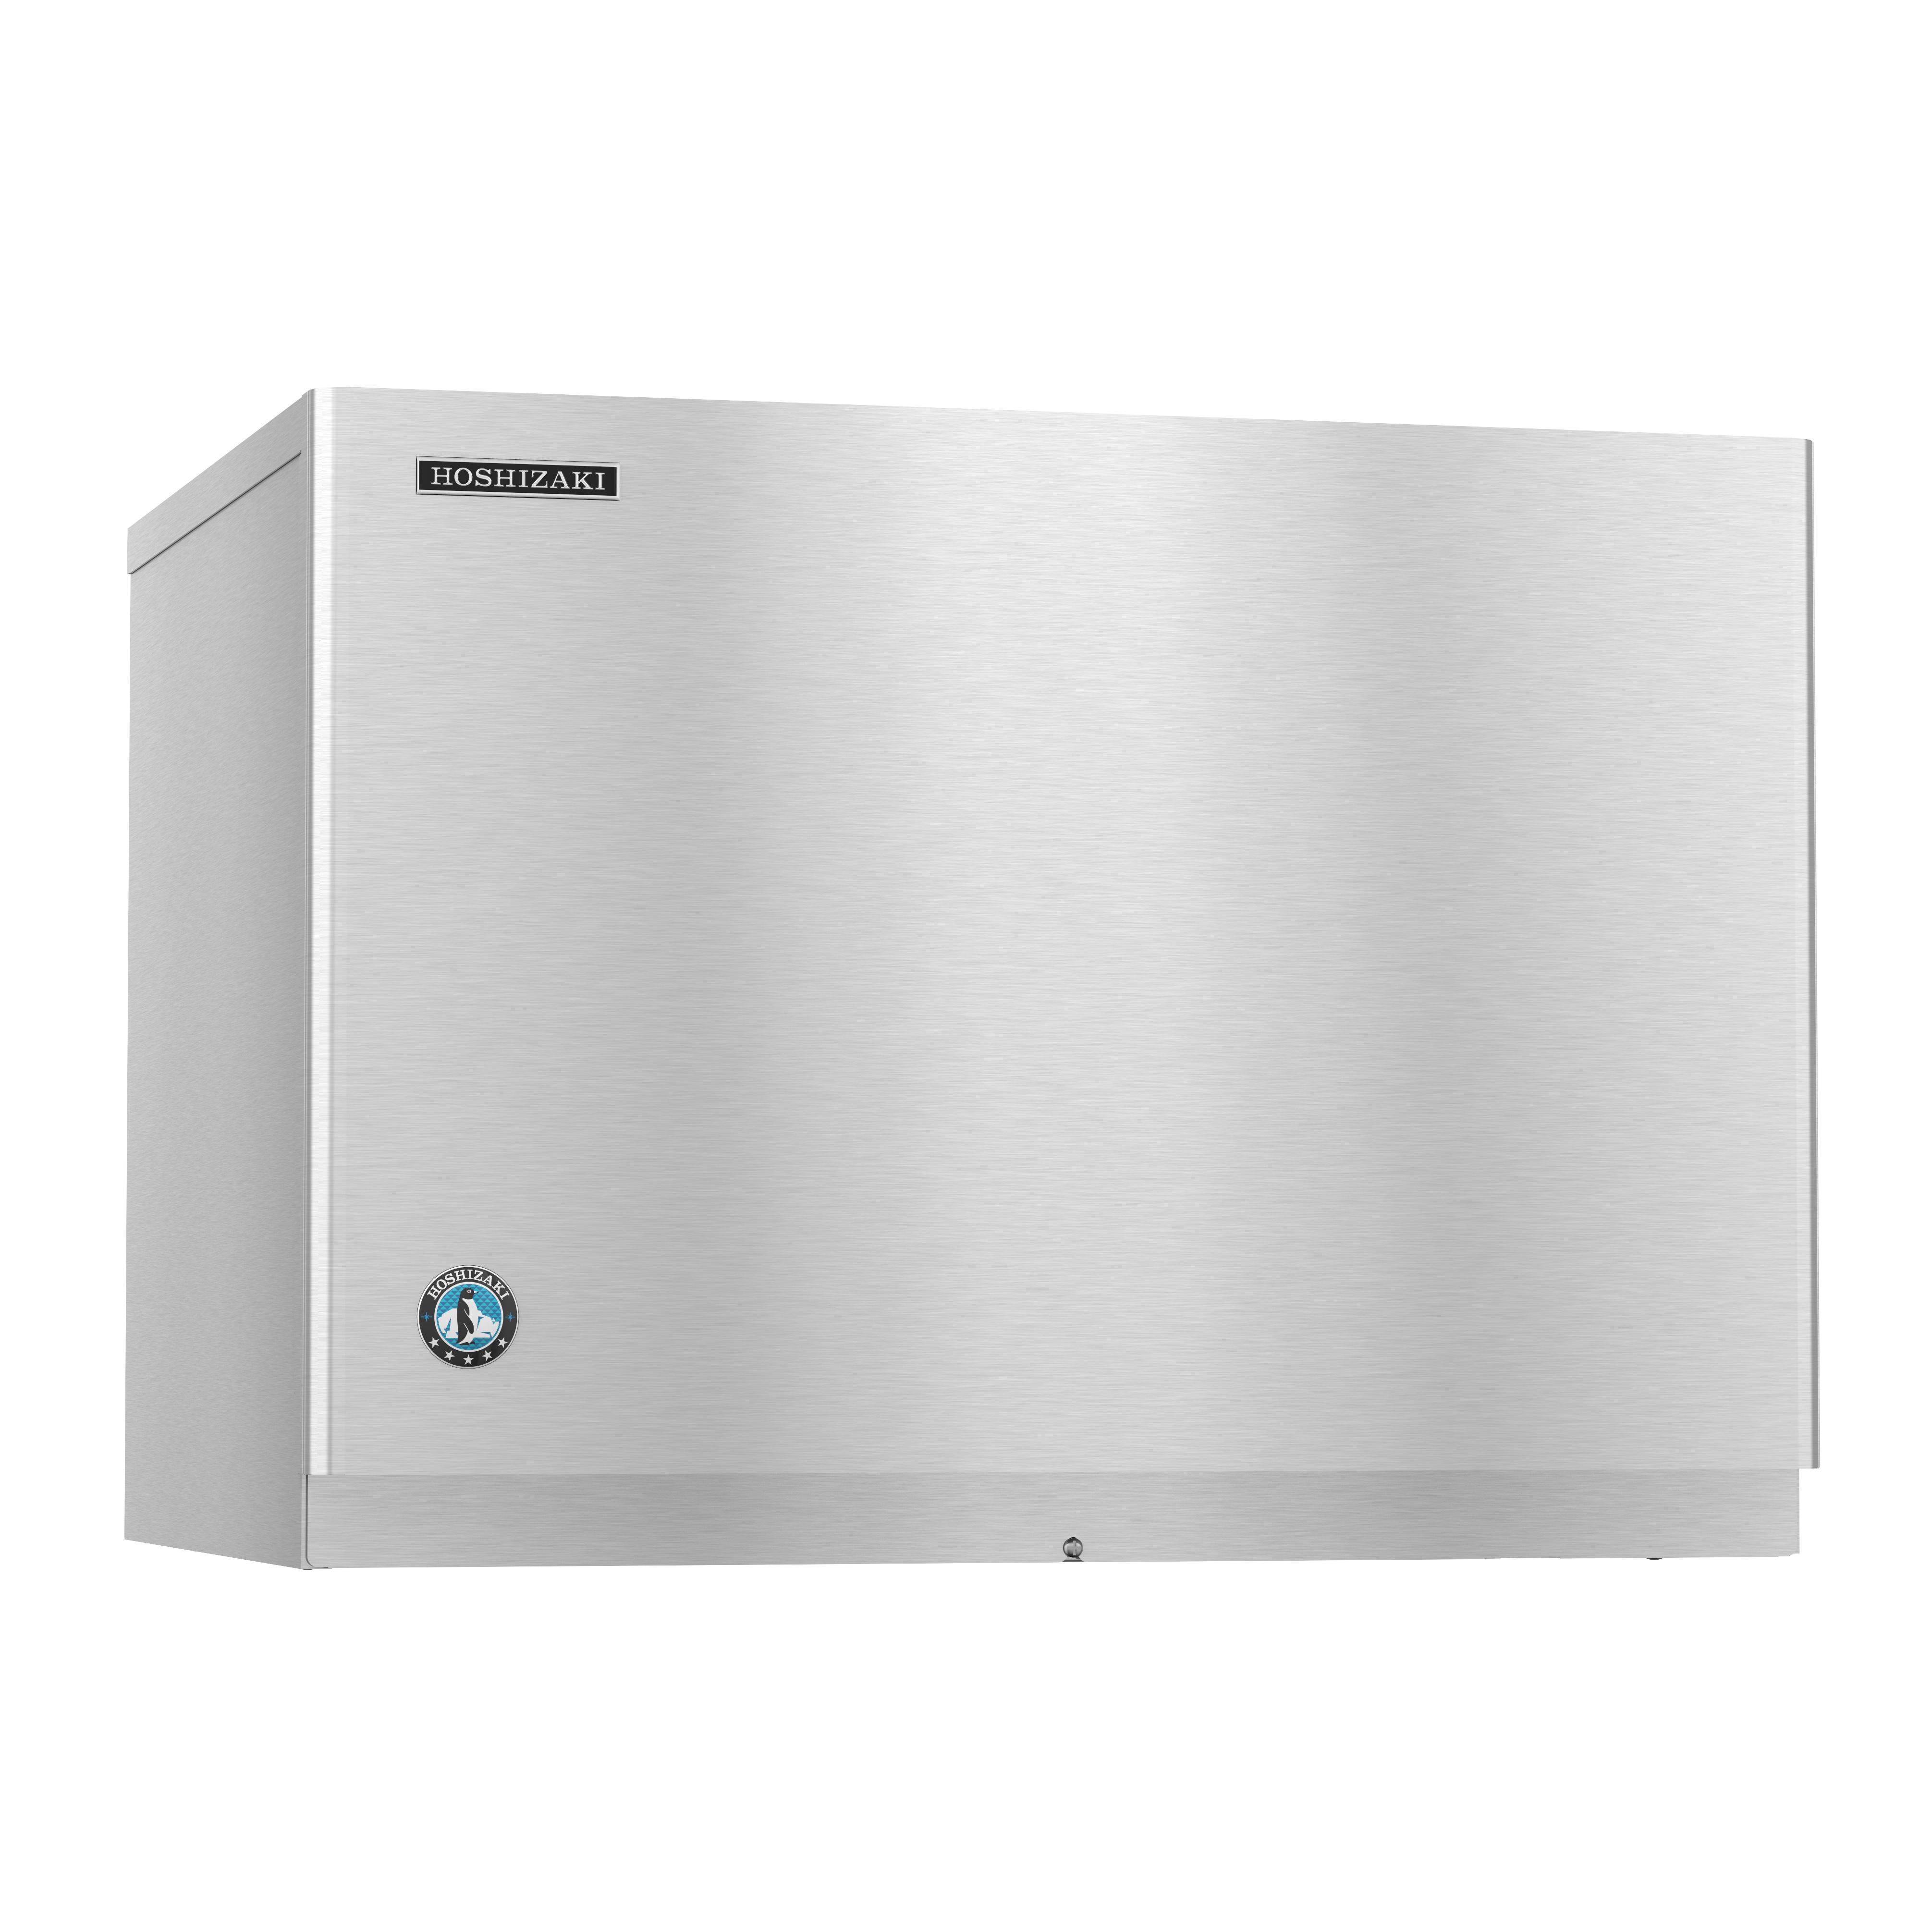 Hoshizaki KMD-460MAJ ice cubers, ice storage & ice dispensers